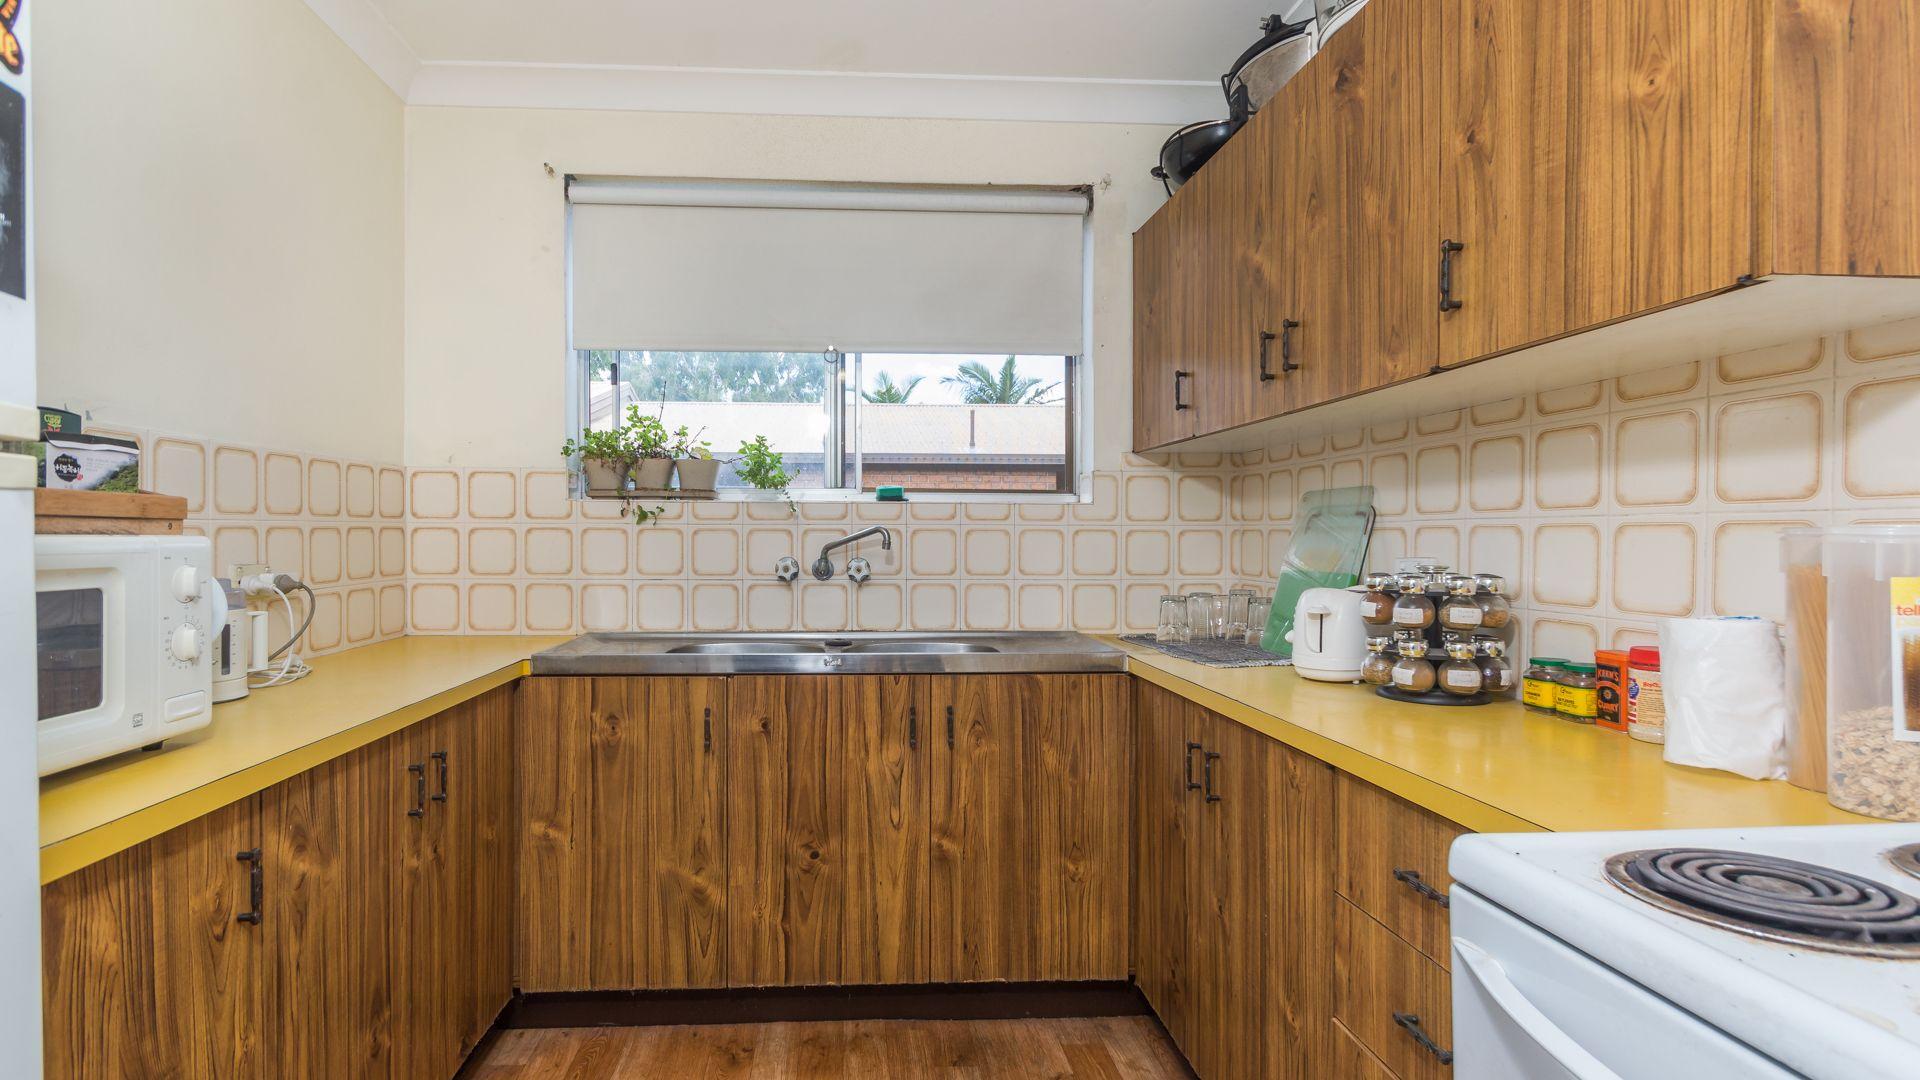 3/24 Carl Street, Woolloongabba QLD 4102, Image 3